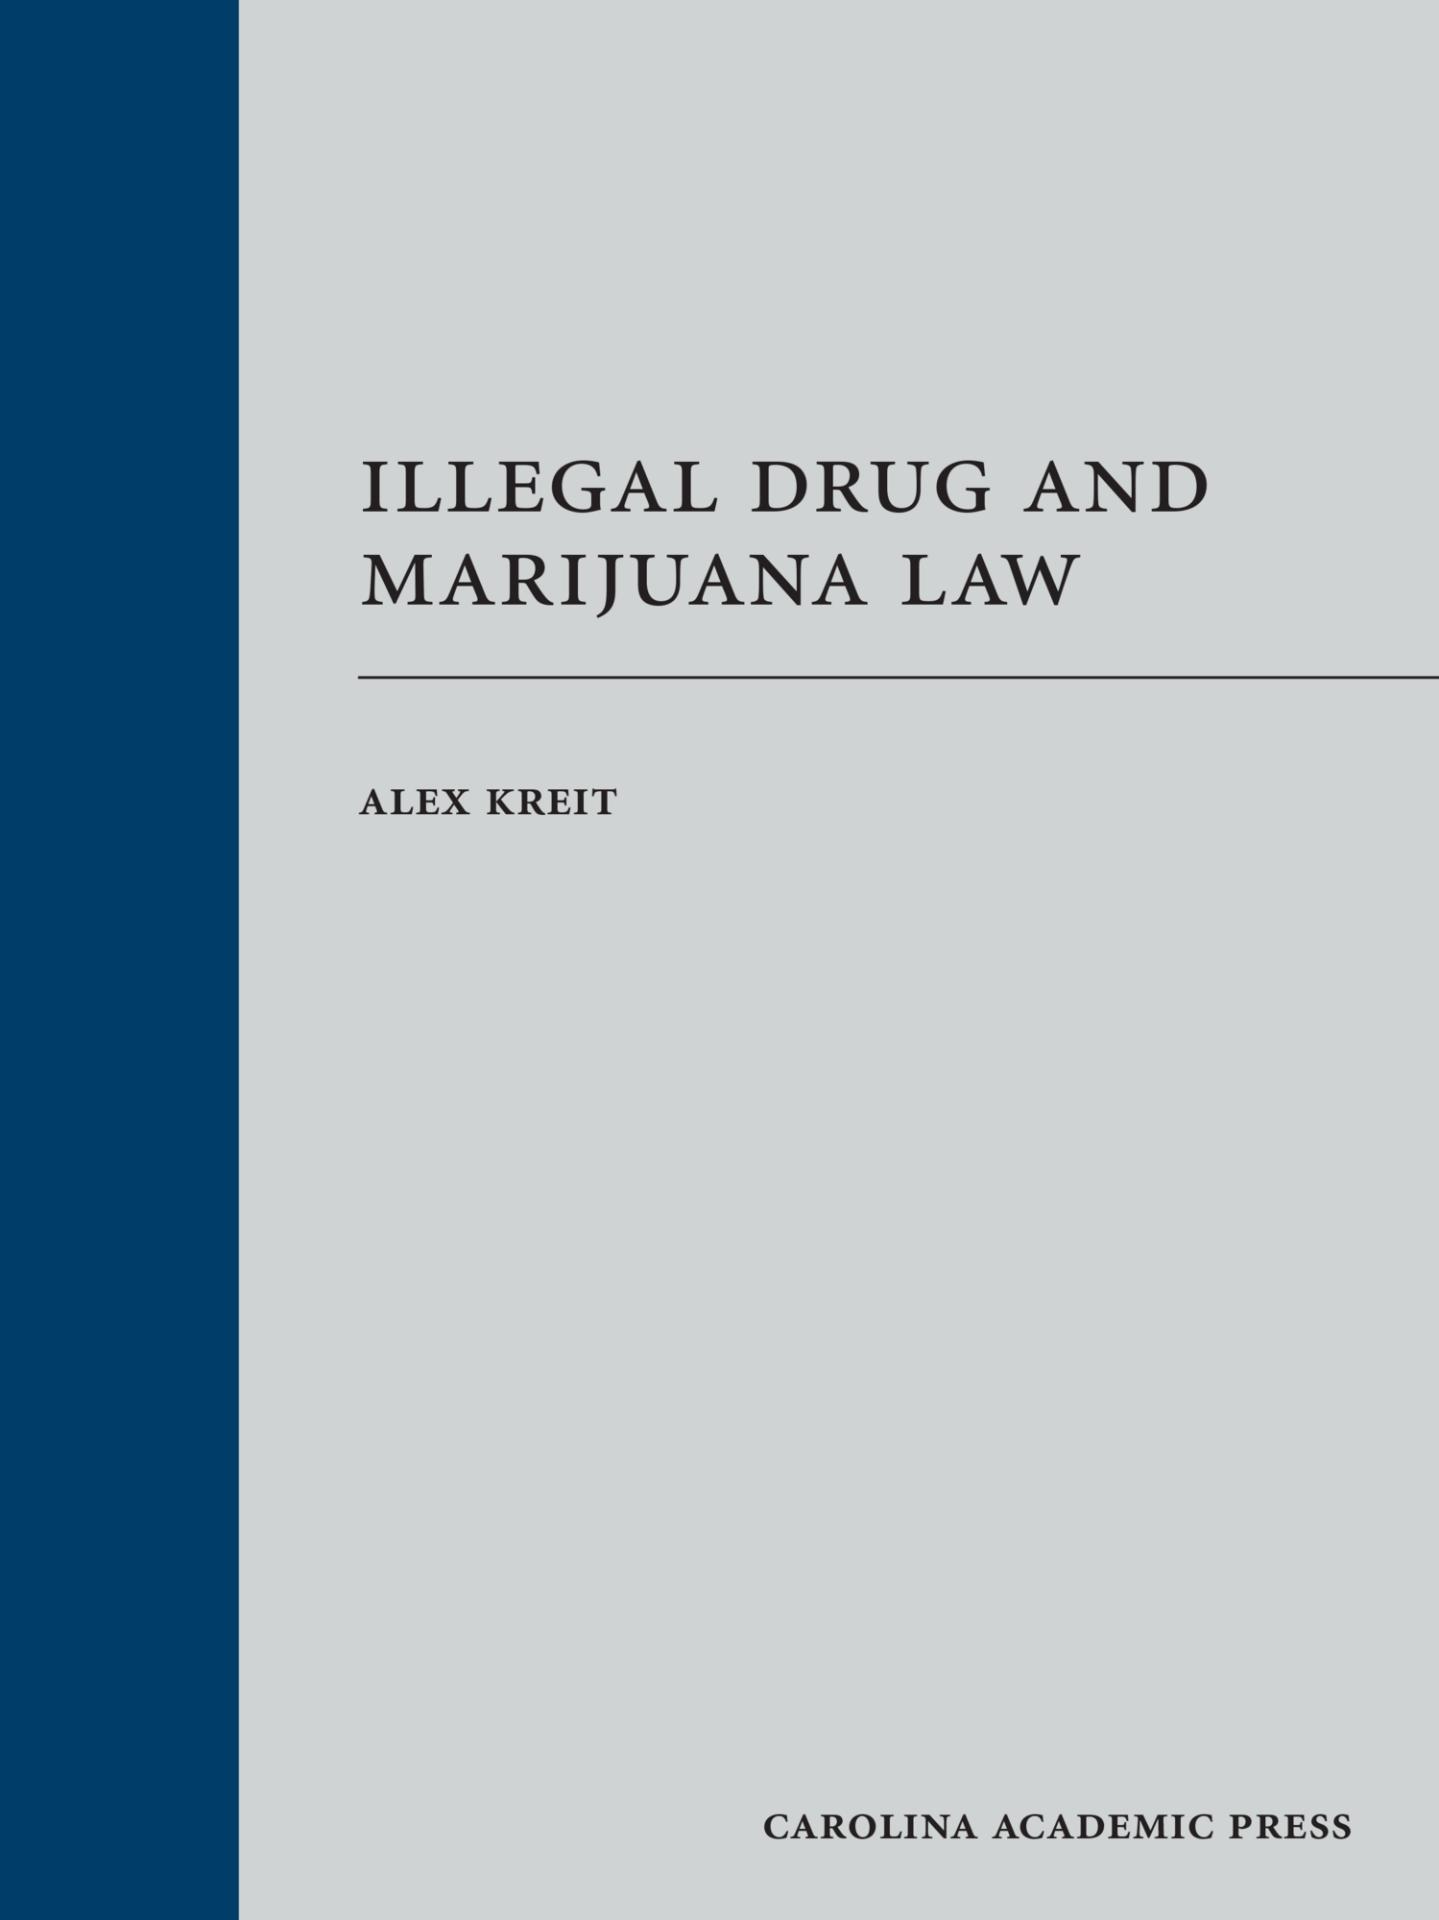 Illegal Drug and Marijuana Law